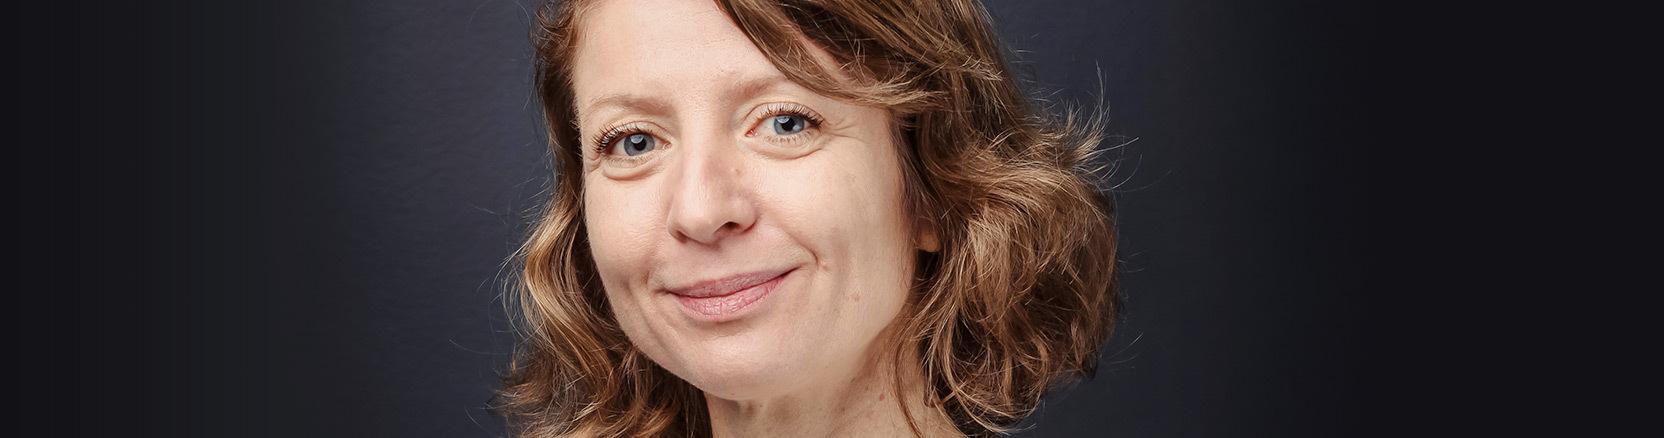 Laura azenard bandeau